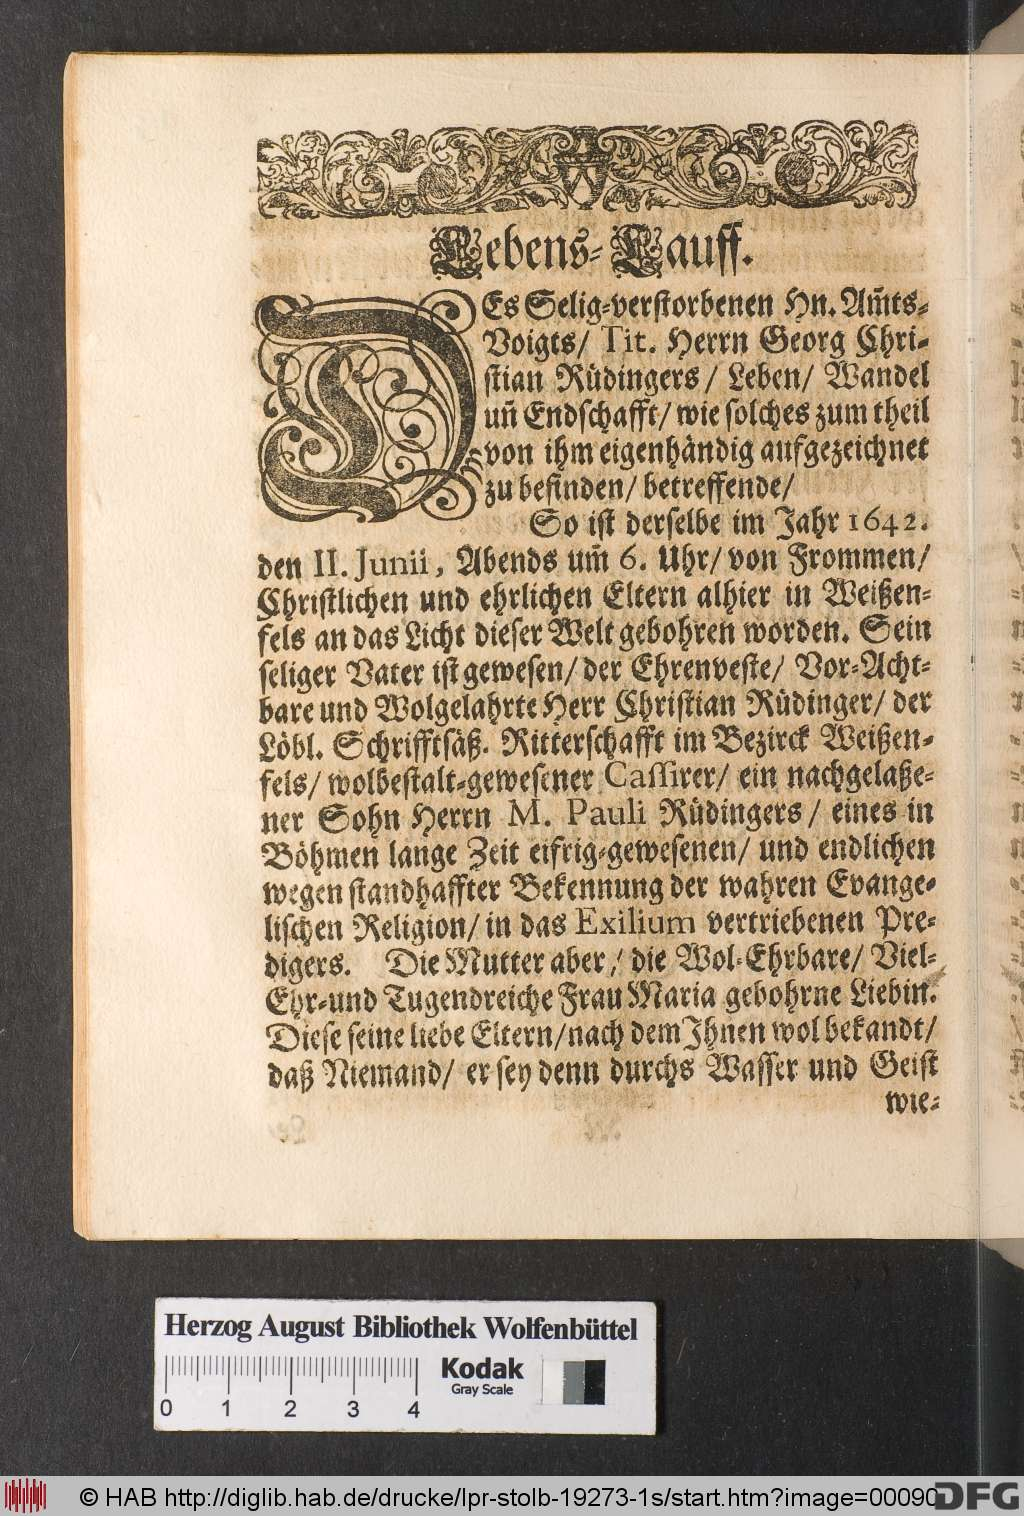 http://diglib.hab.de/drucke/lpr-stolb-19273-1s/00090.jpg